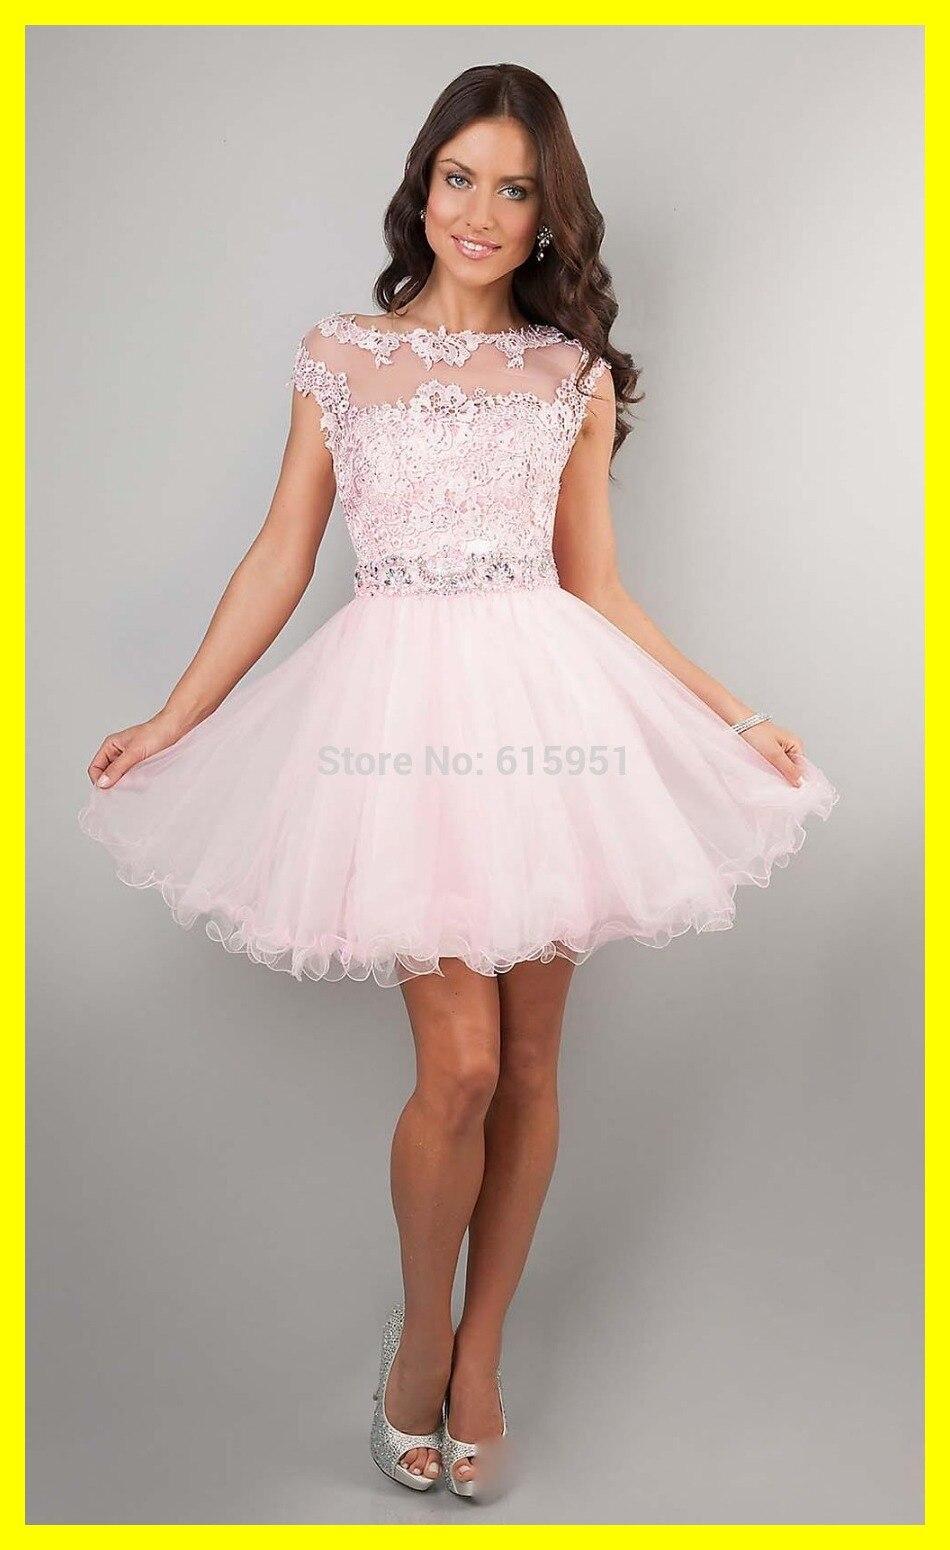 Good Dress Stores